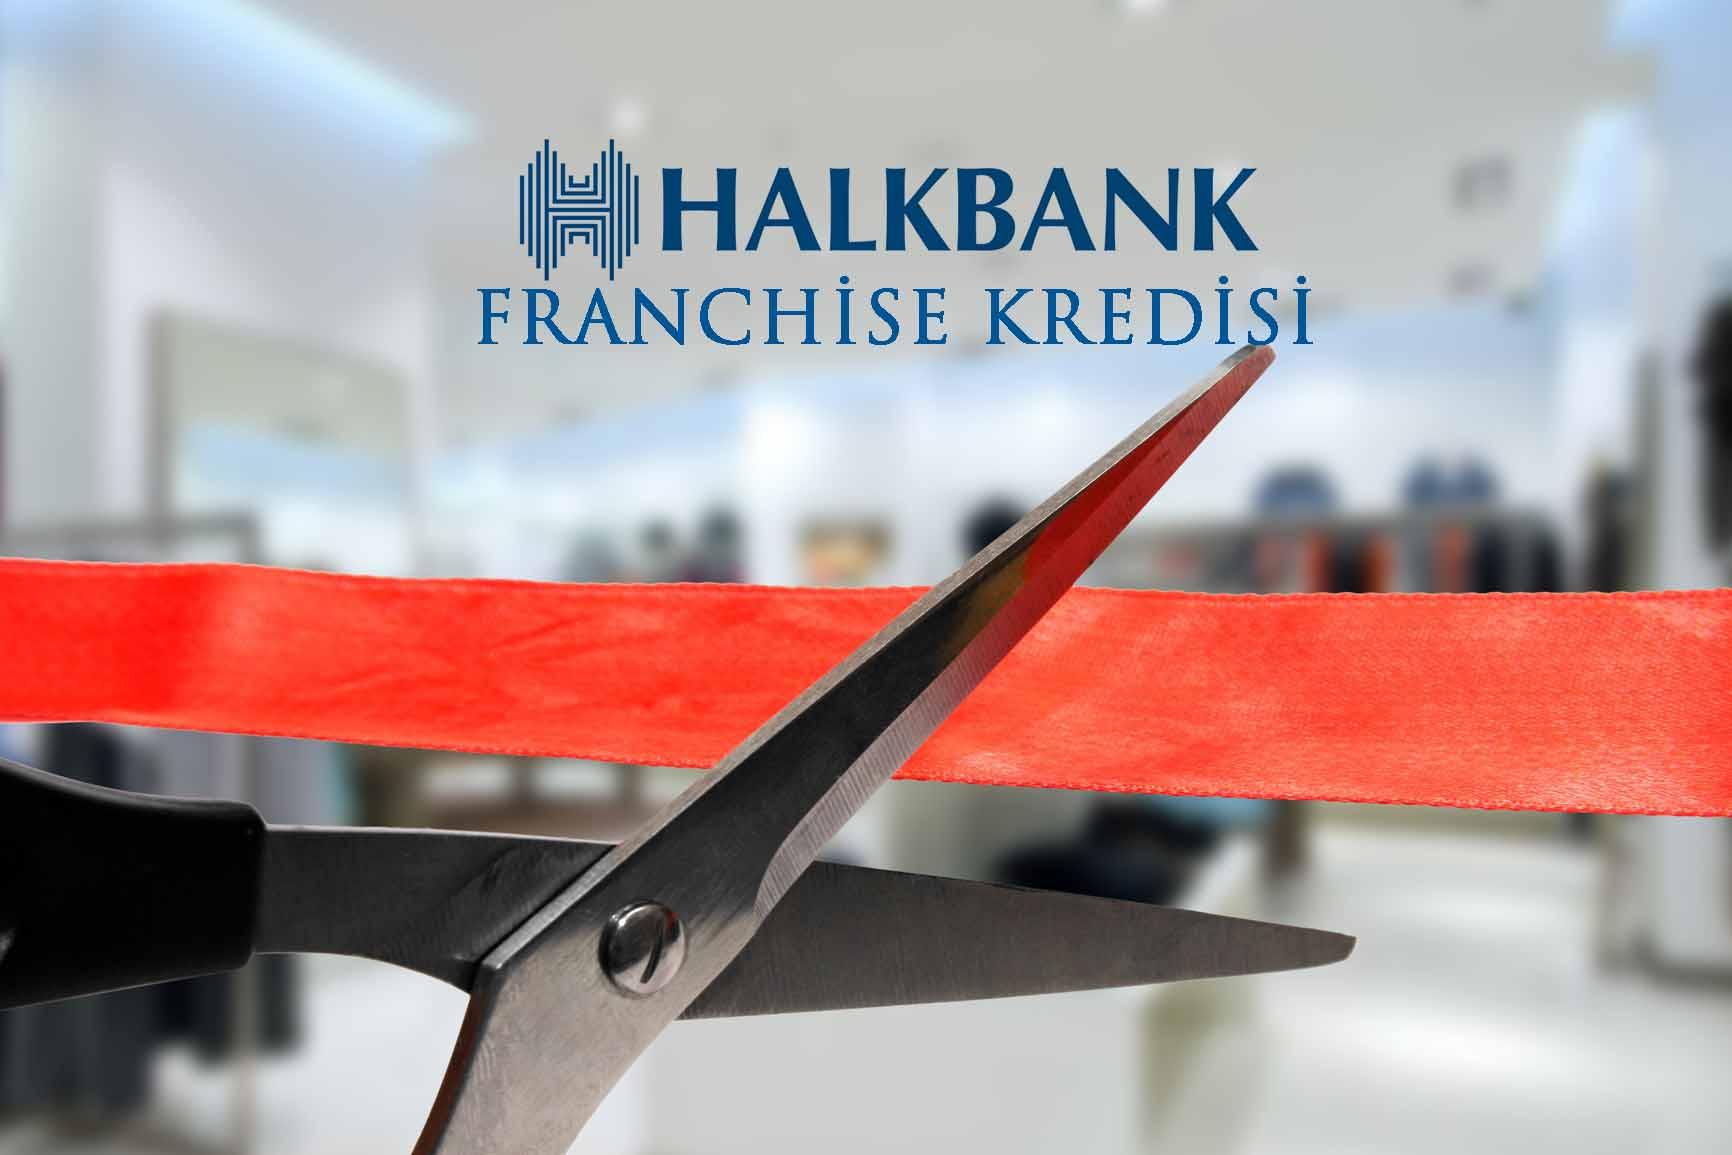 Halkbank Franchise Kredisi